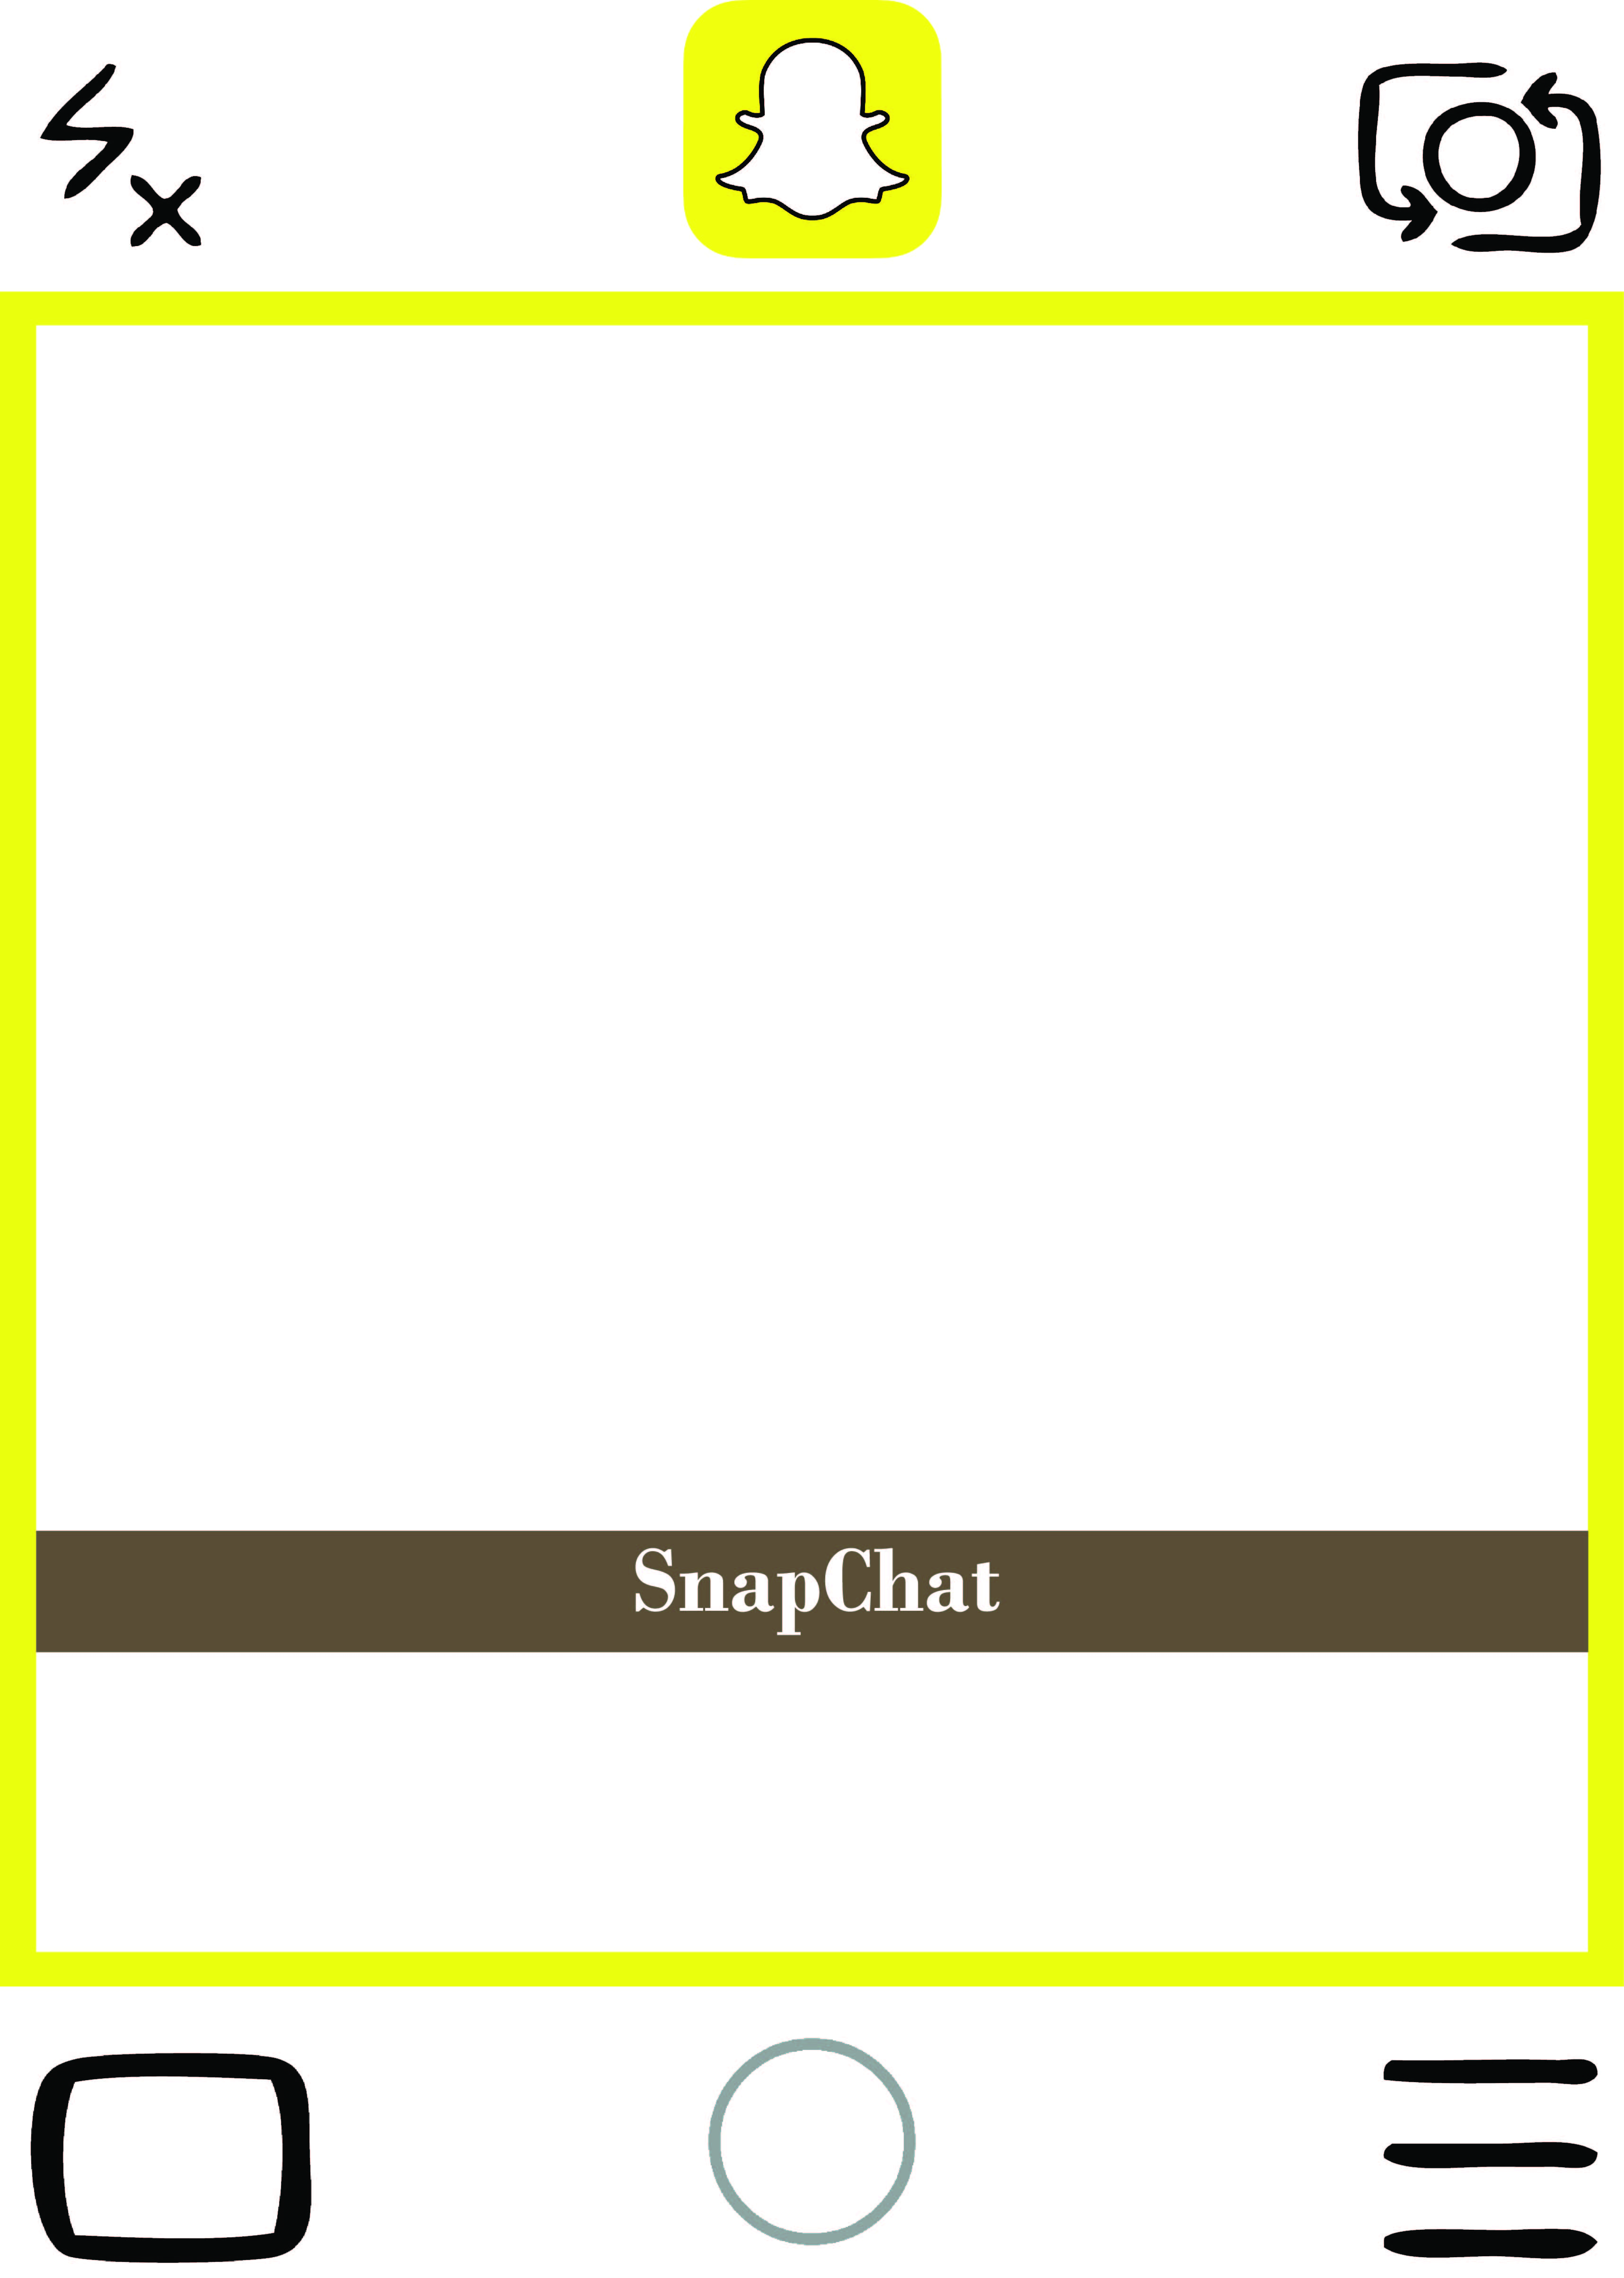 snapchat-photo-board.jpg